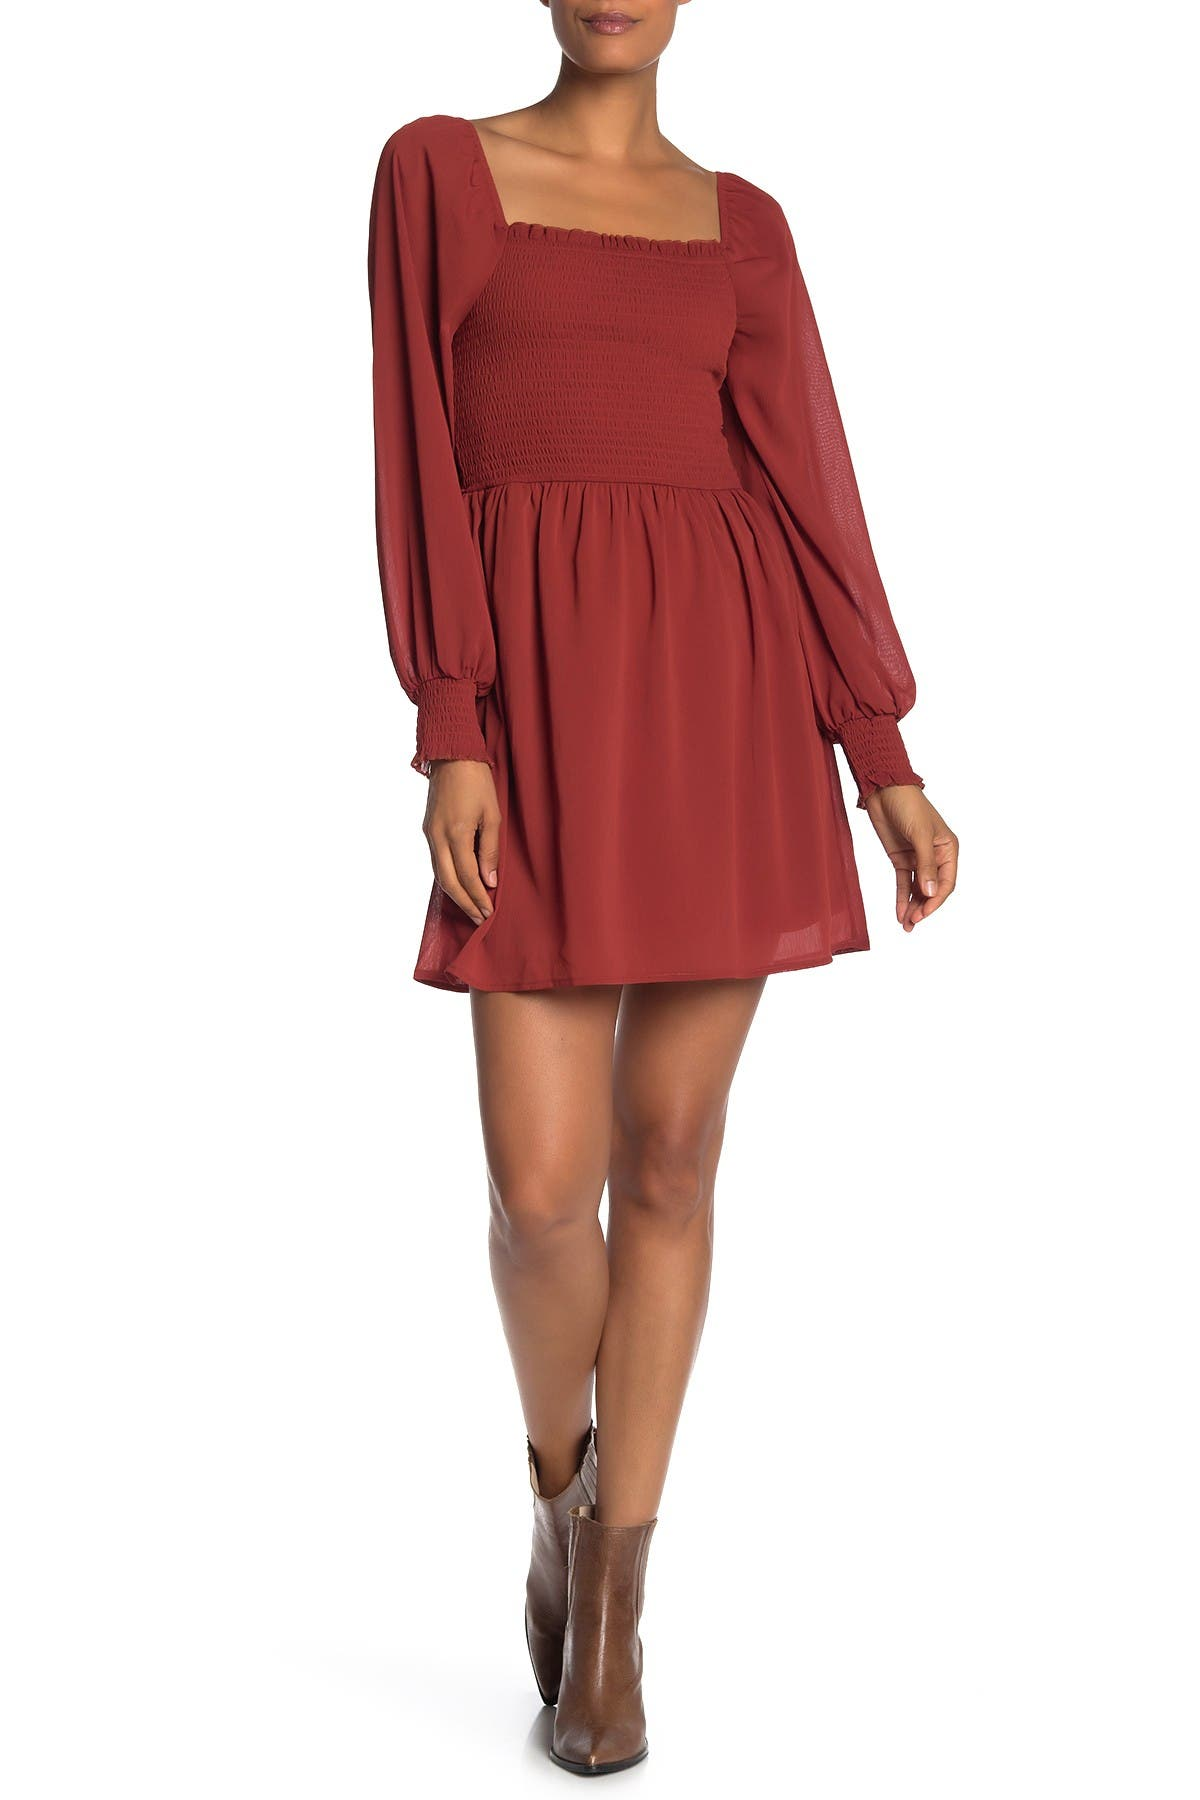 Image of KENEDIK Smocked Square Neck Dress